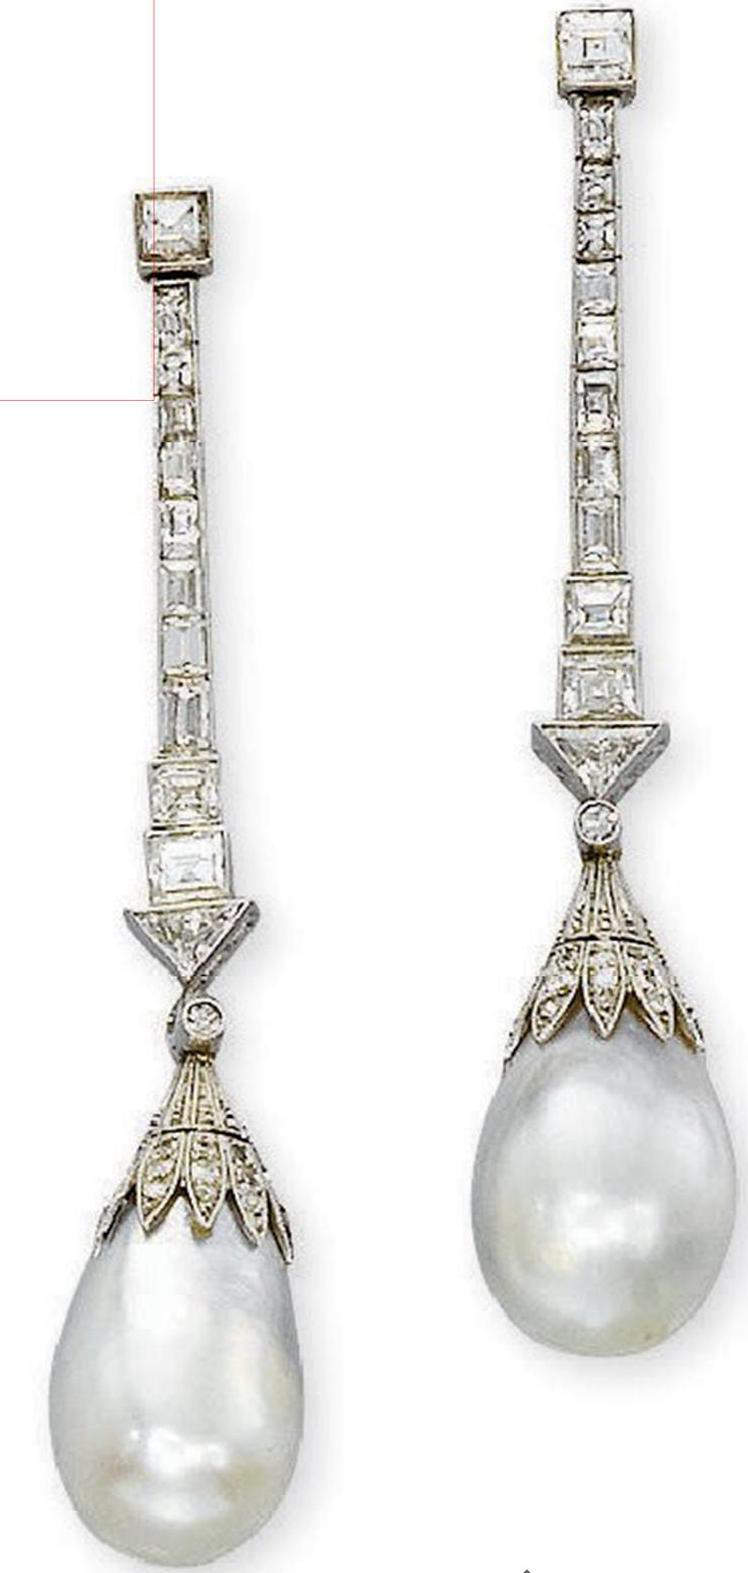 Pair of natural pearl & diamond ear pendants